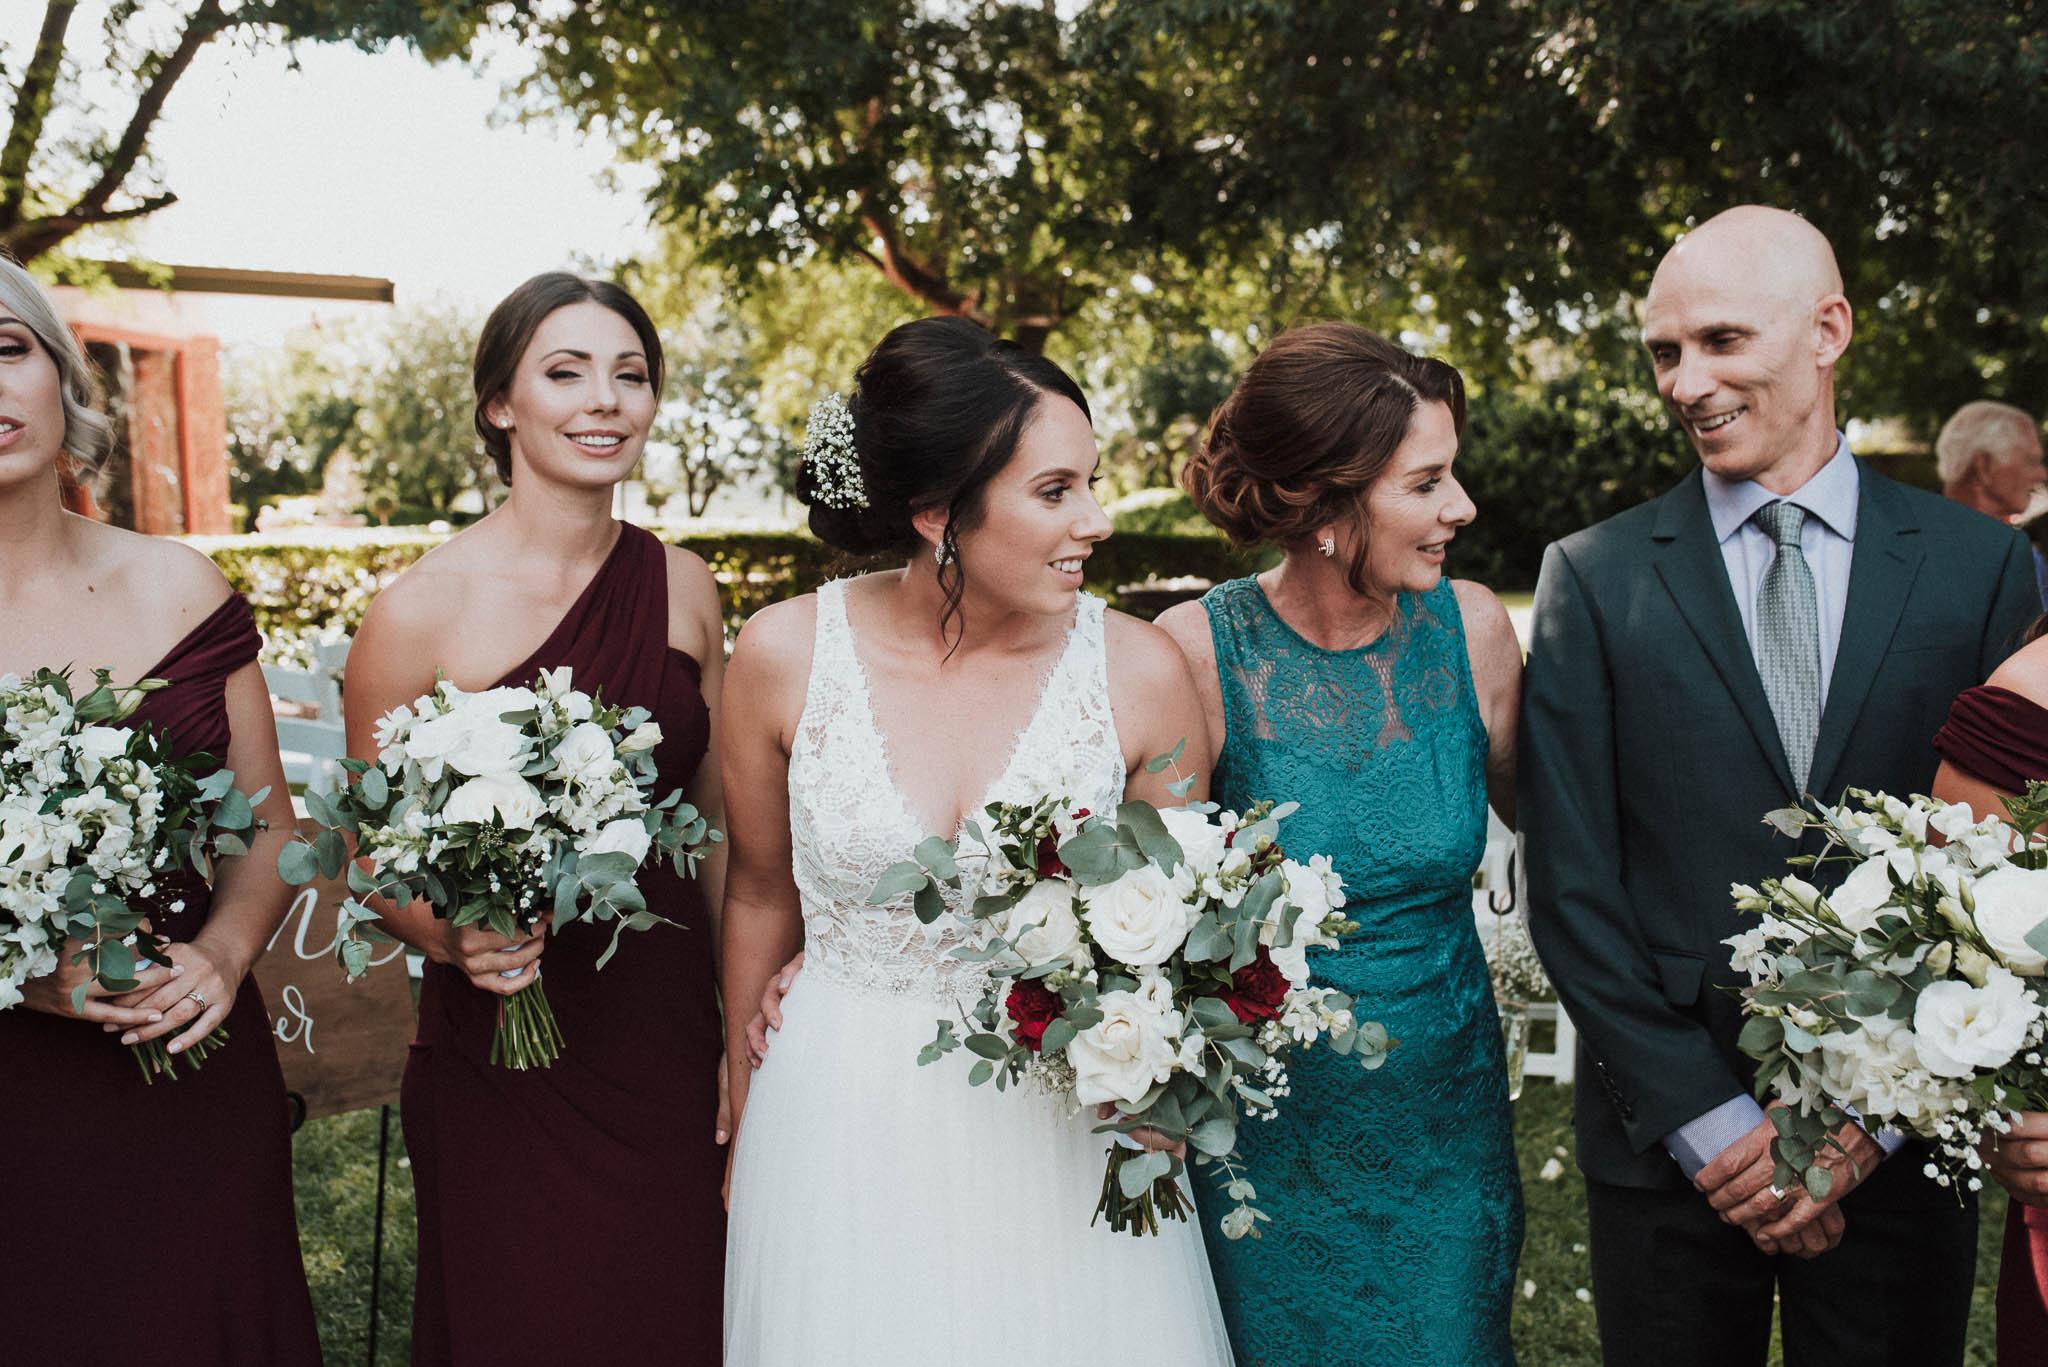 MECURE-RESORT-WEDDING-KING-WEB-152.jpg